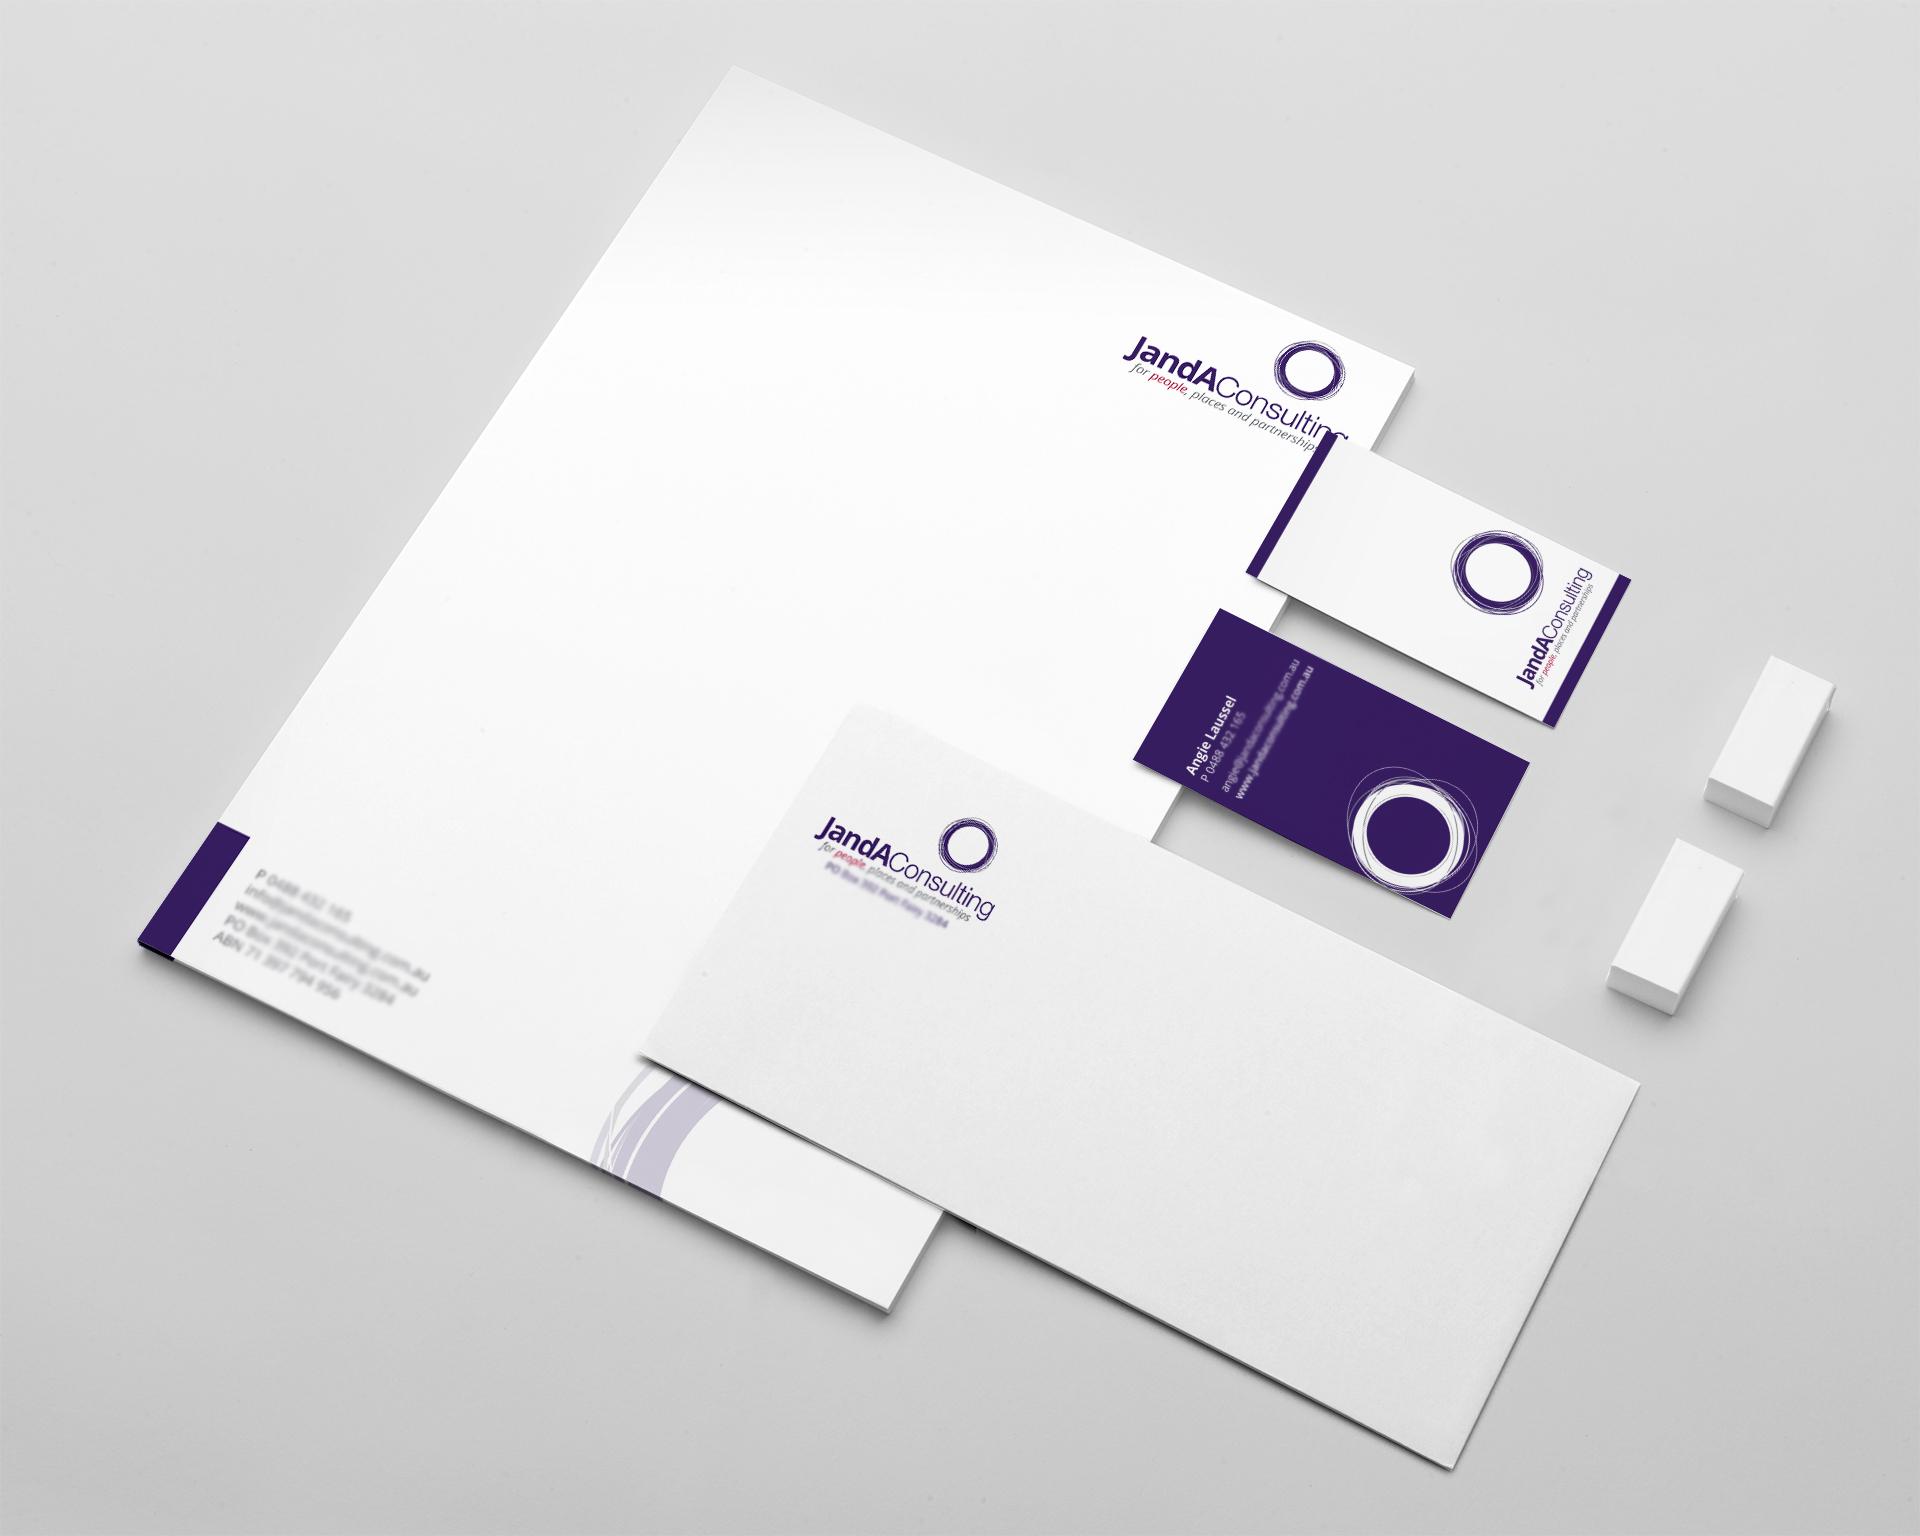 Identity design set by Logoland